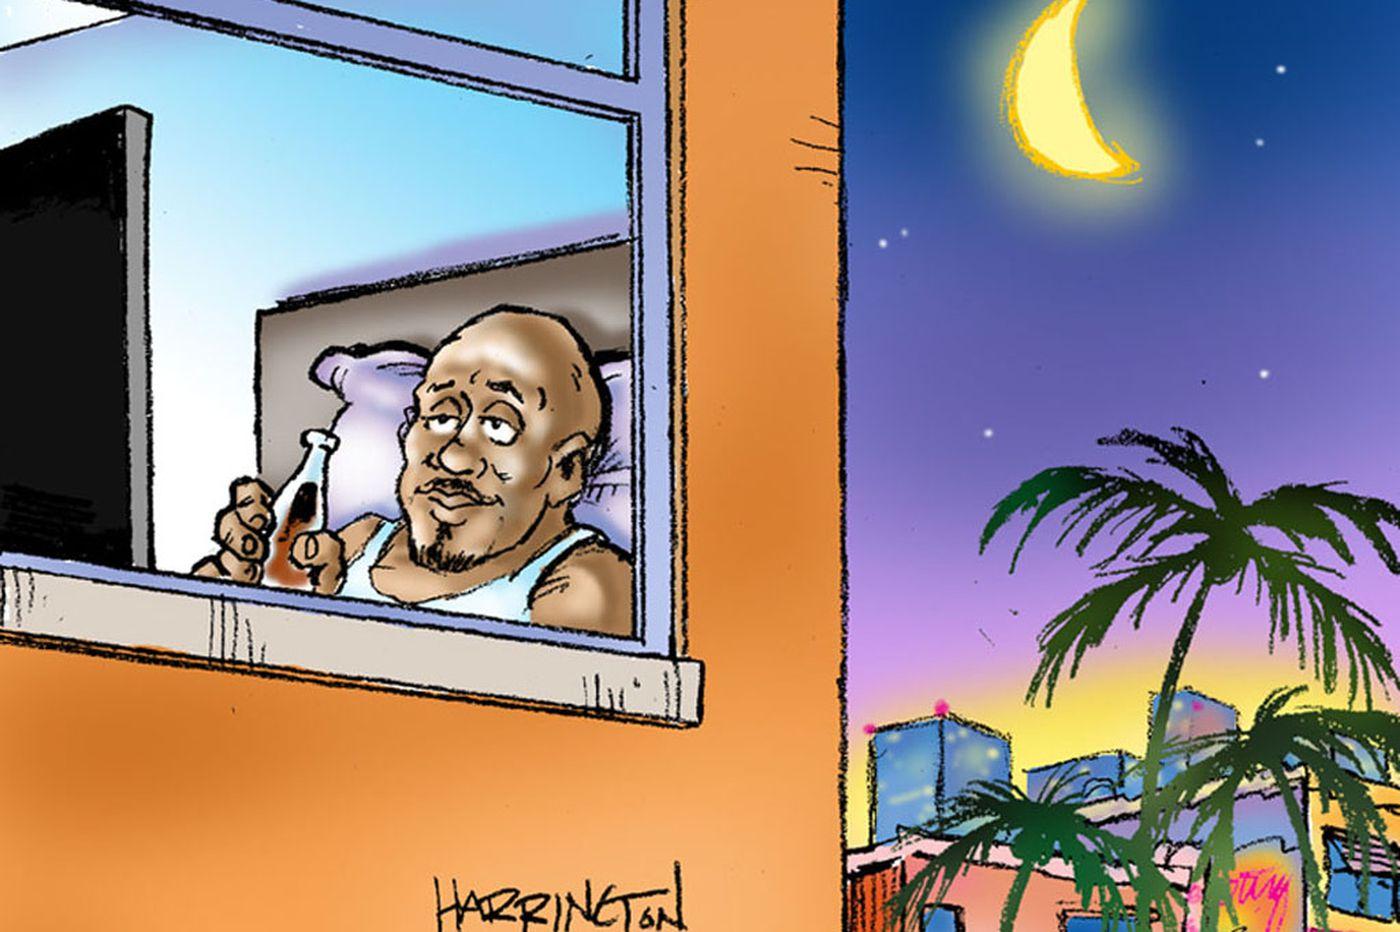 Solomon Jones: A night in Miami Beach isn't what it used to be